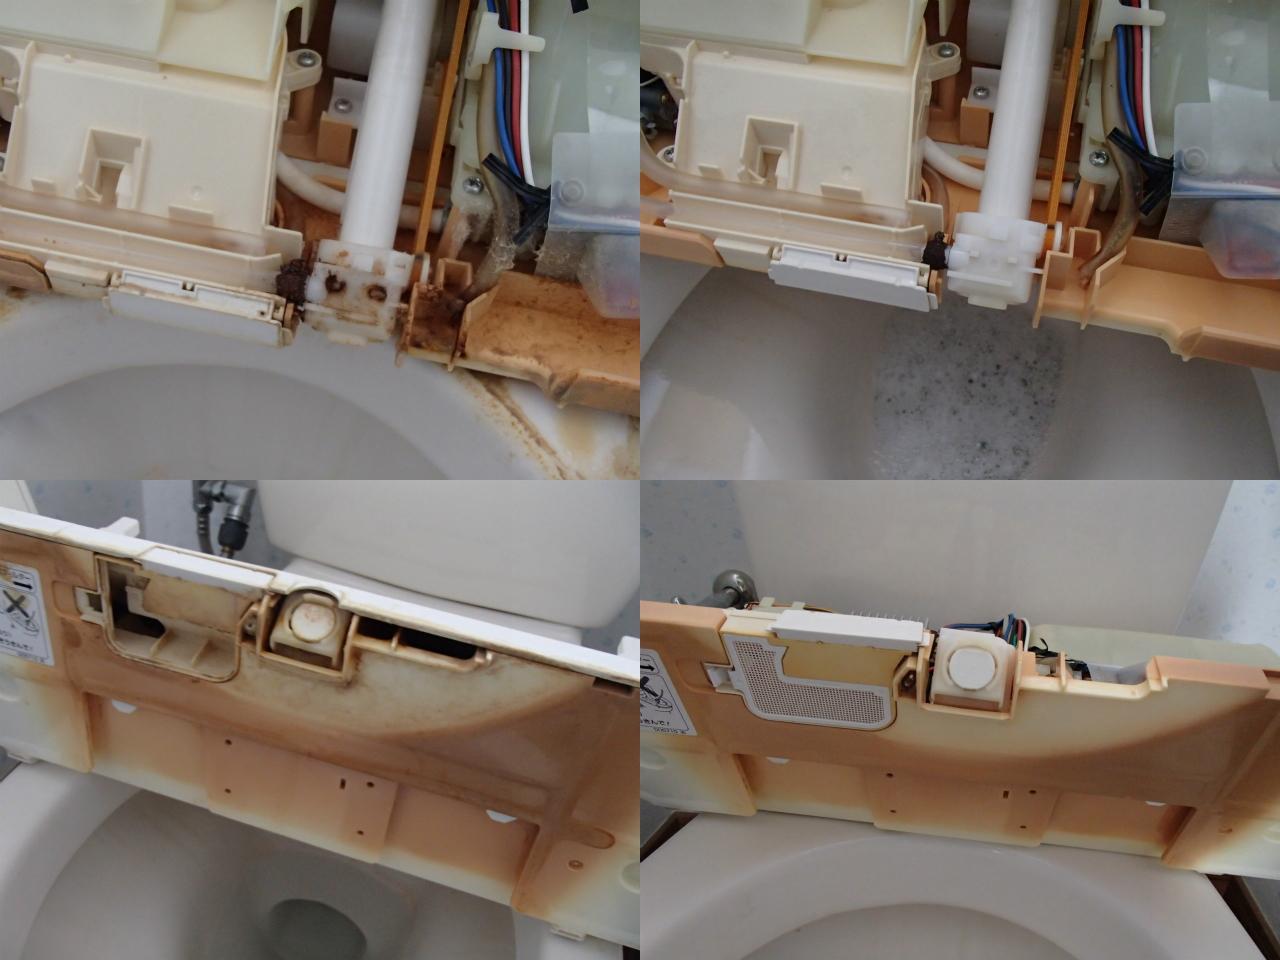 http://ajras.net/images/130212-ordermade3.jpg